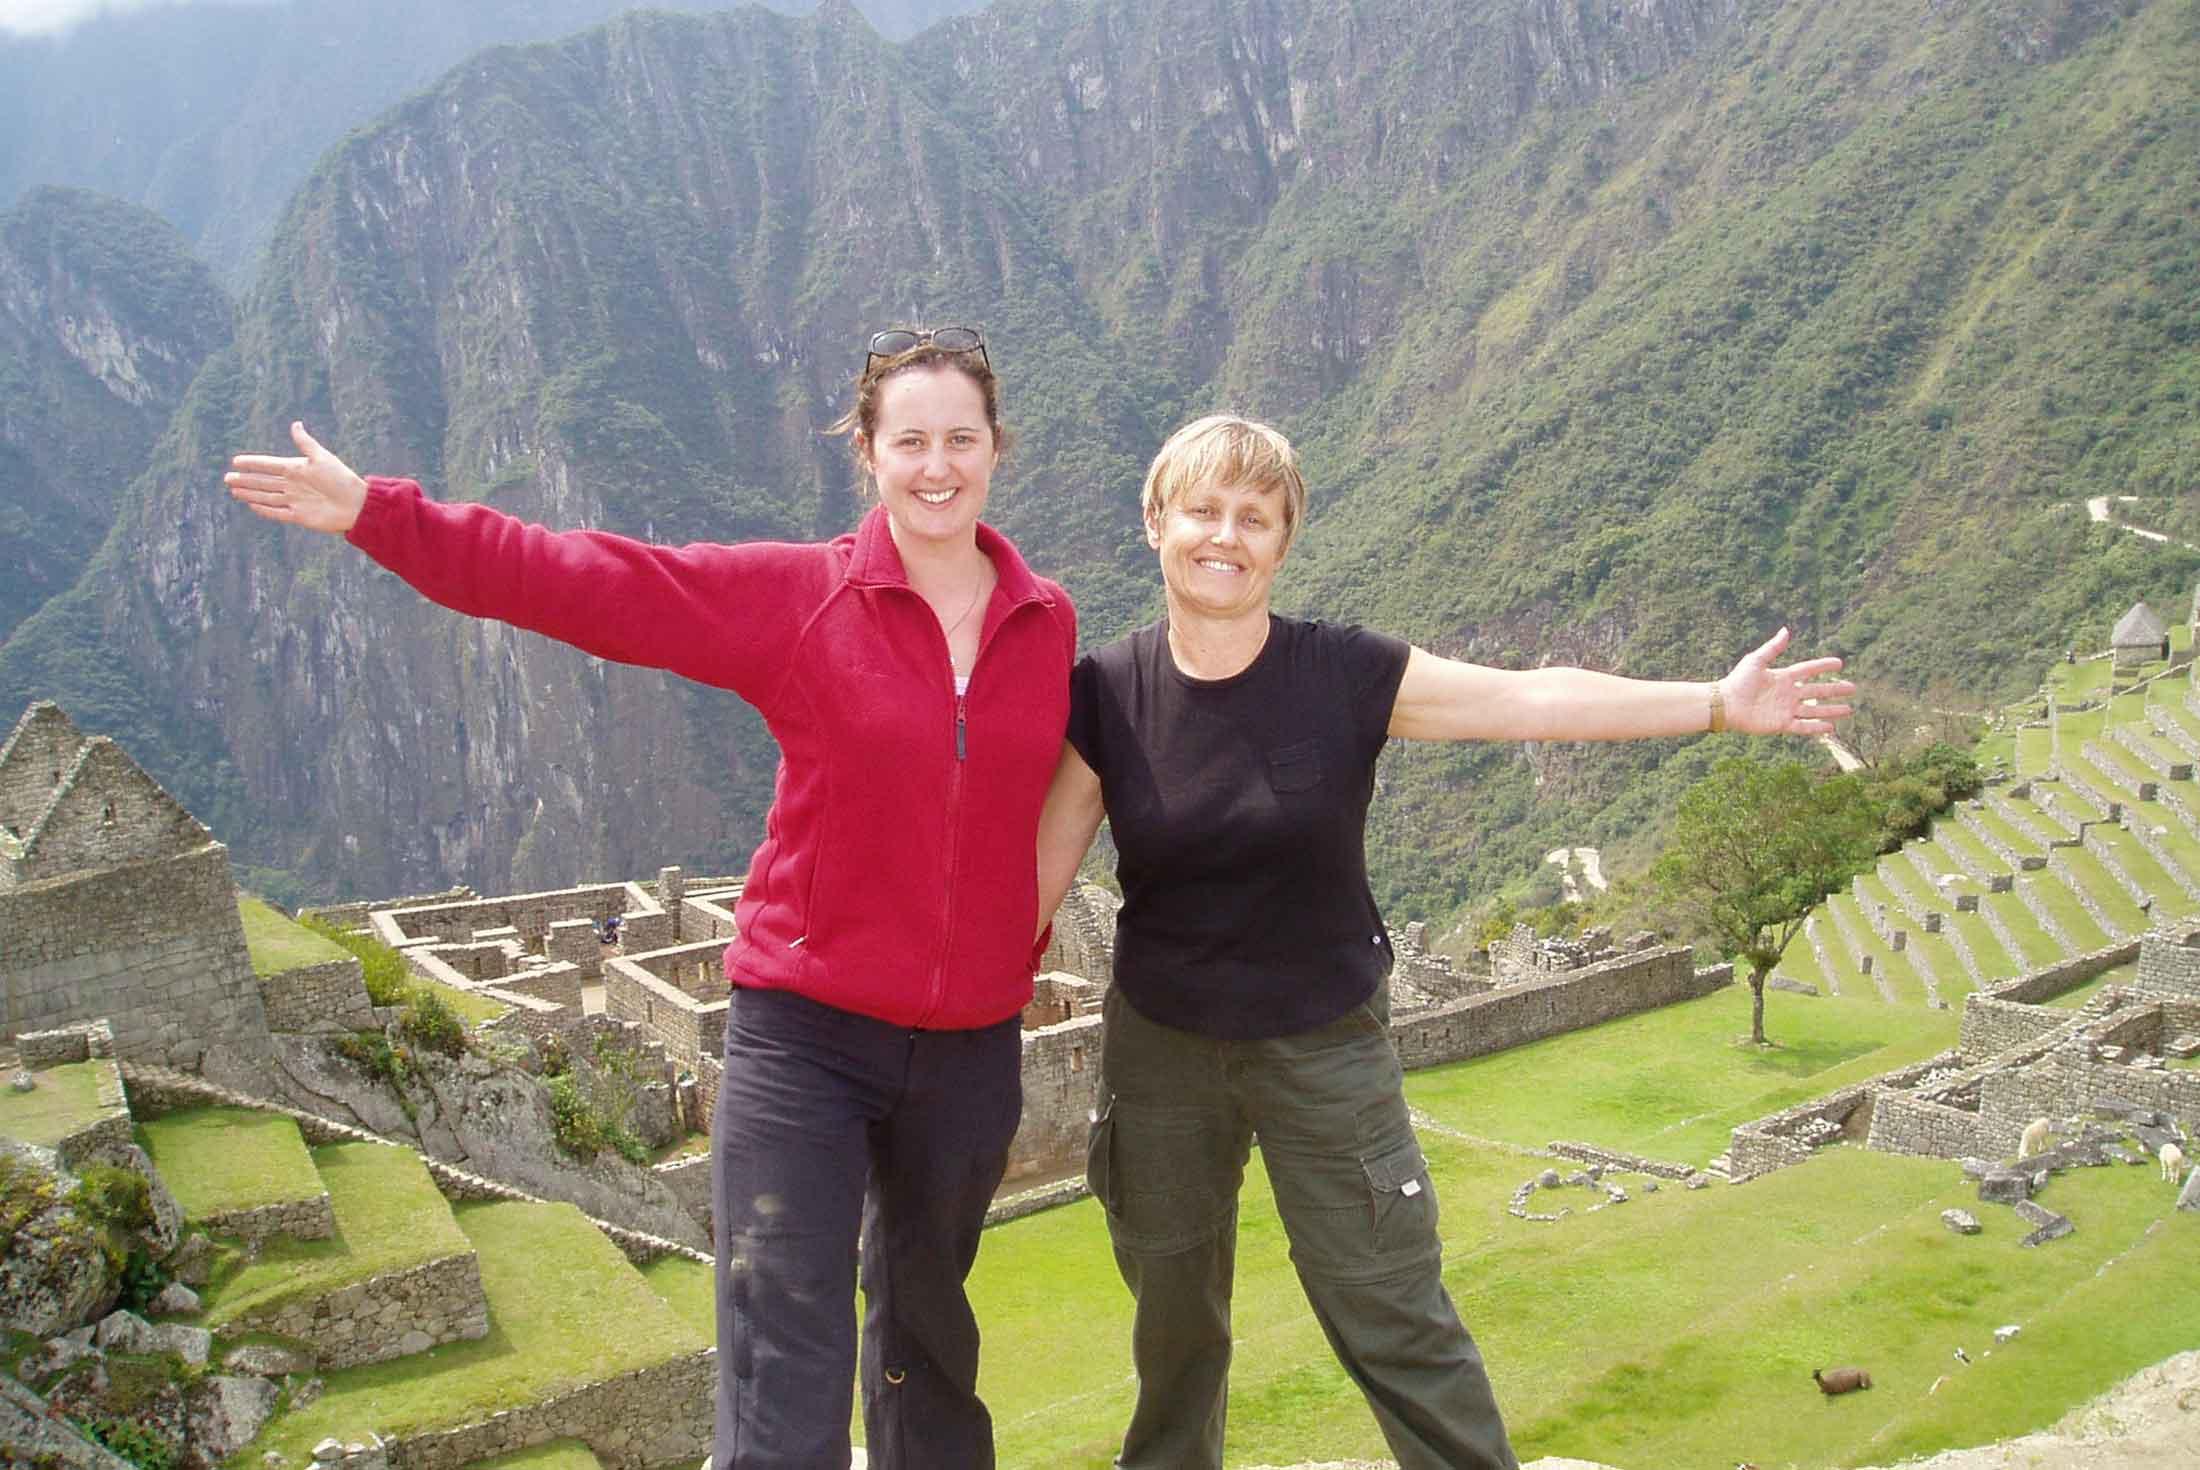 One Day Inca Trail to Machu Picchu 3